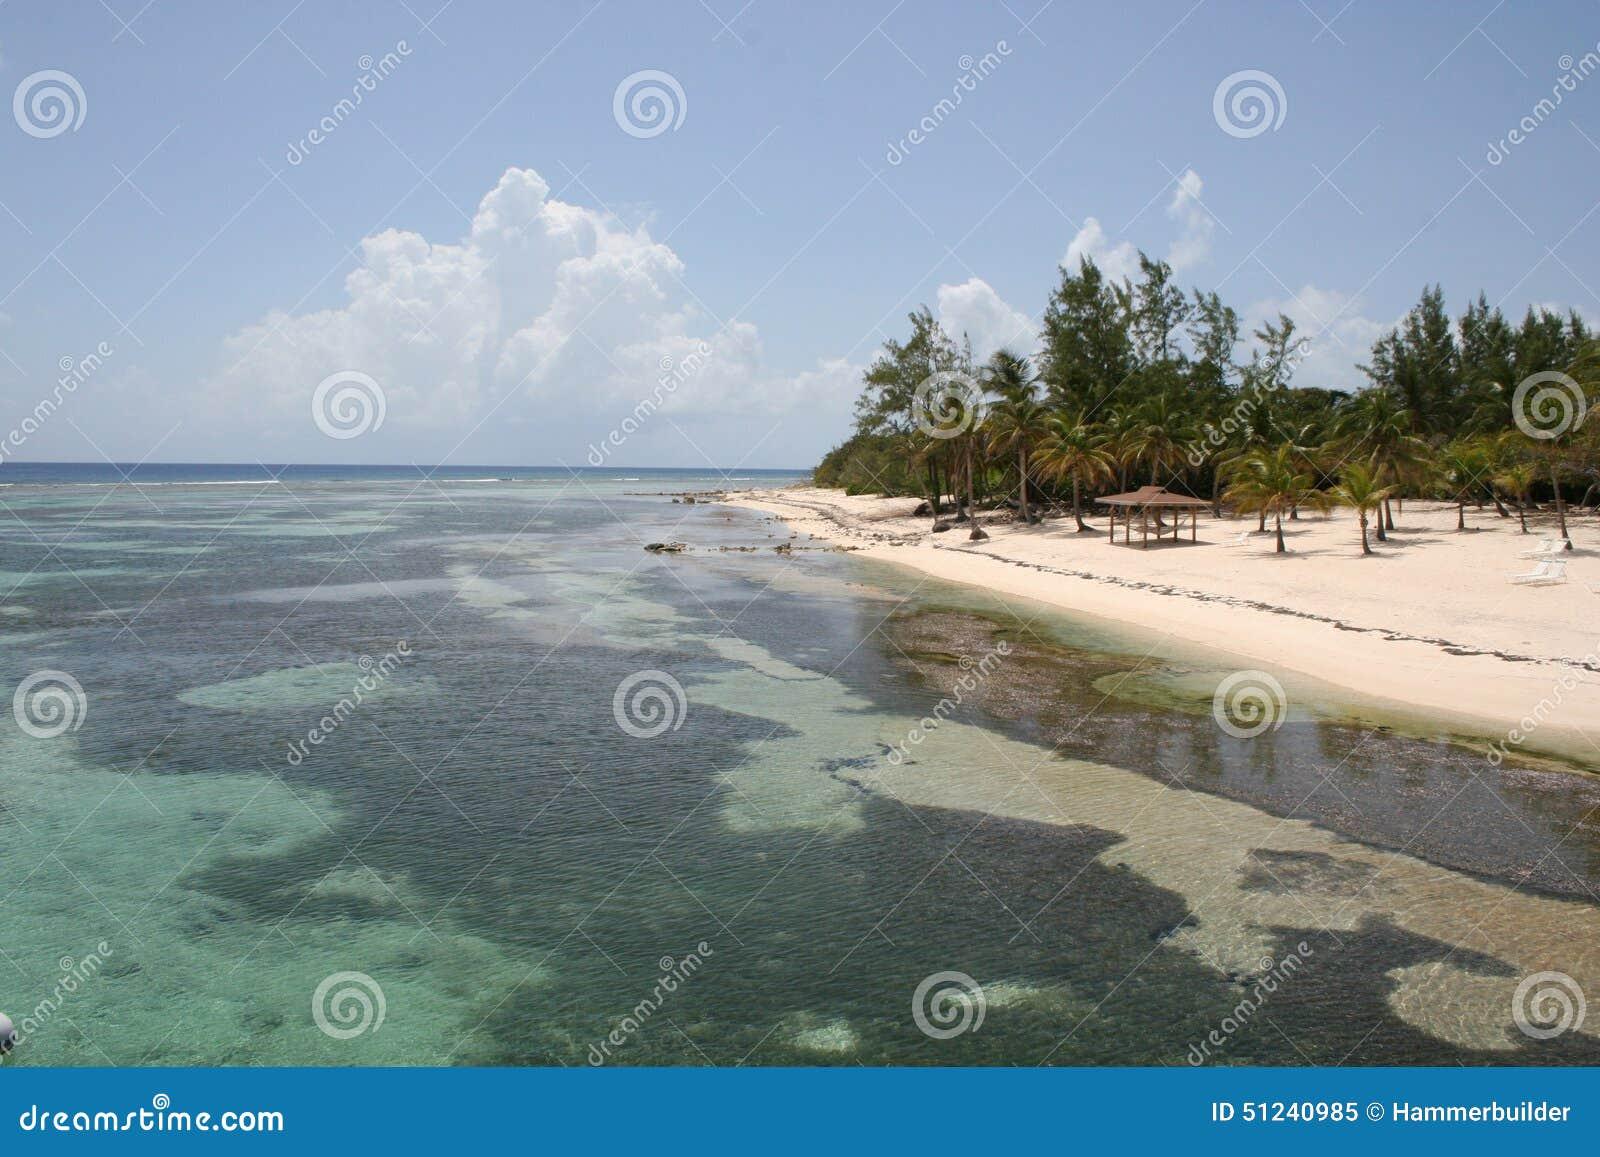 Tropical Island Beach Hut: Beach Hut On Tropical Island Stock Photography